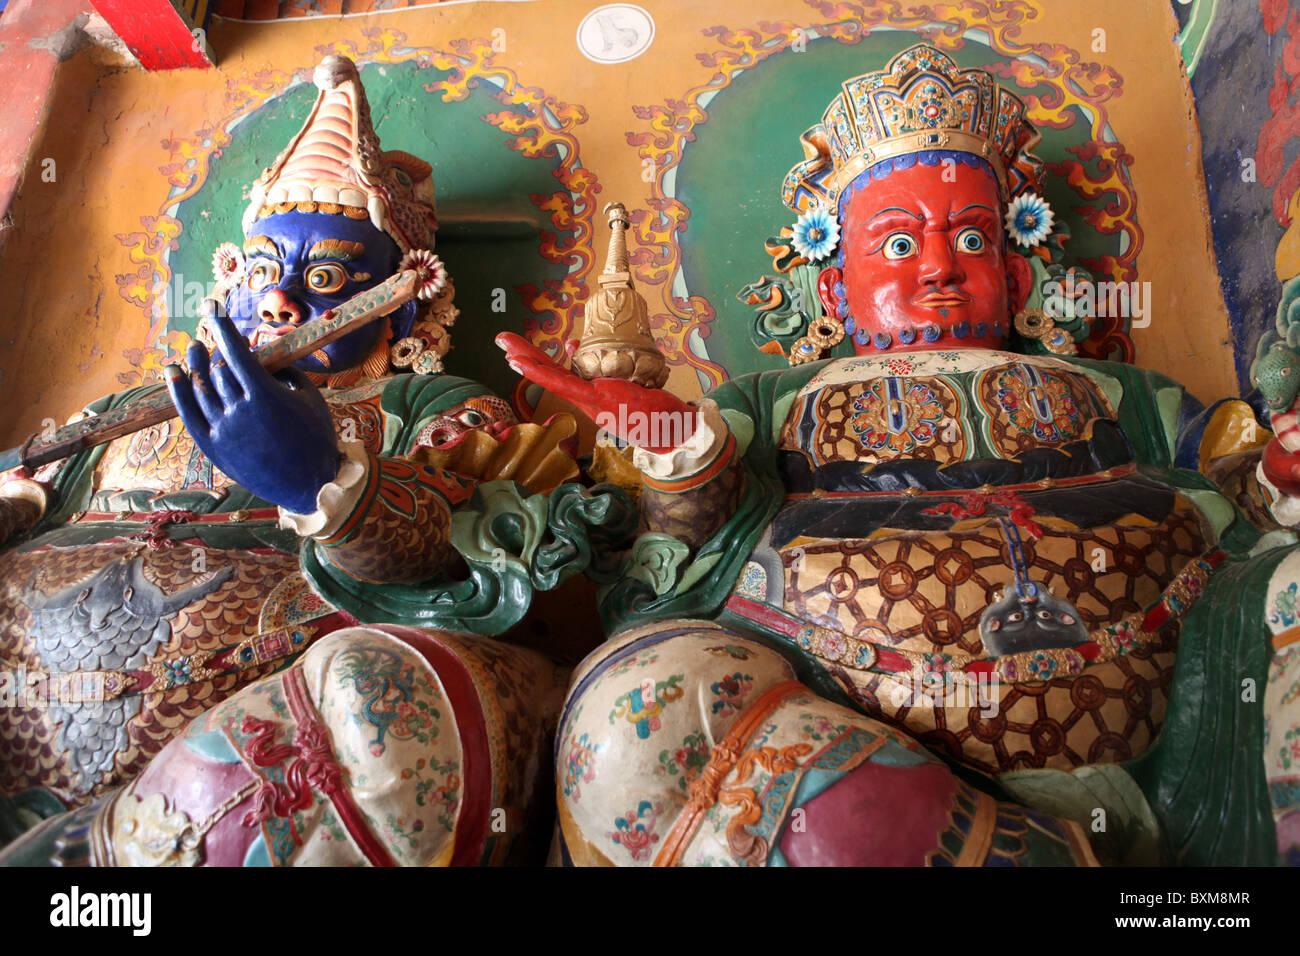 Statues inside the  Gyangtse Kumbum part of the Palcho Monastery in Tibet - Stock Image